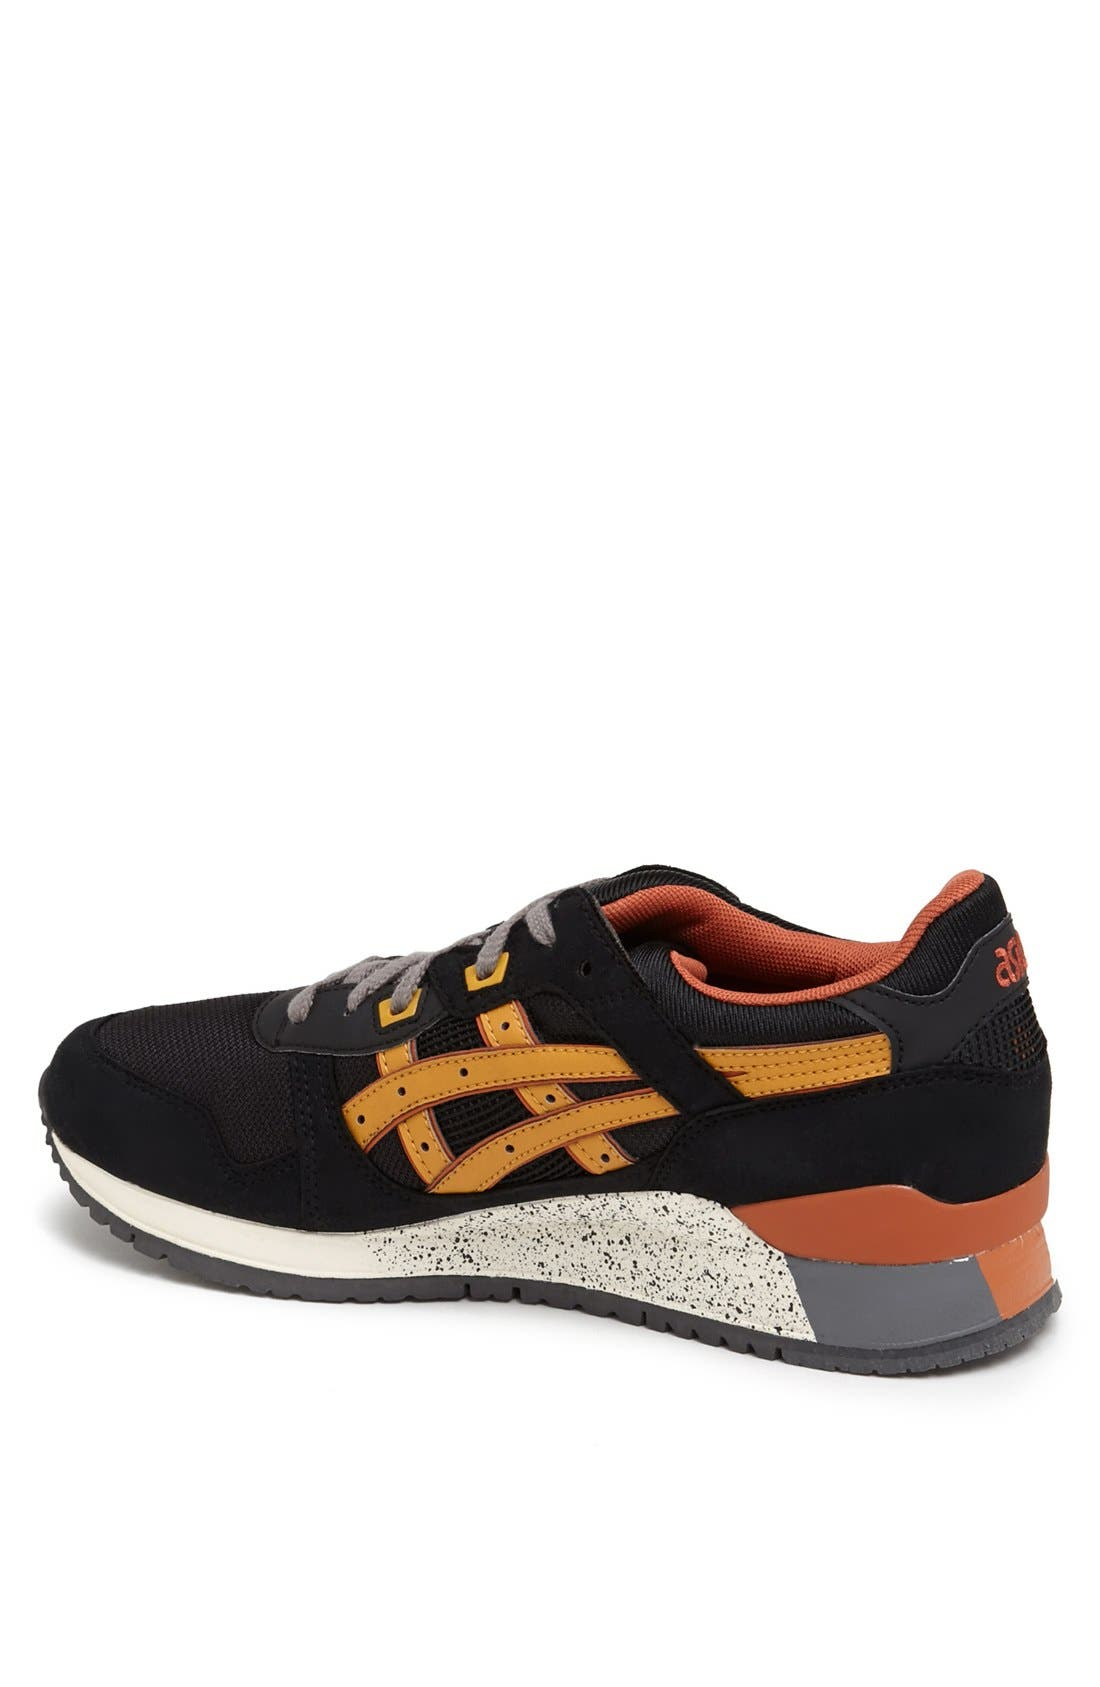 ASICS<SUP>®</SUP>,                             'GEL-Lyte III' Sneaker,                             Alternate thumbnail 3, color,                             002